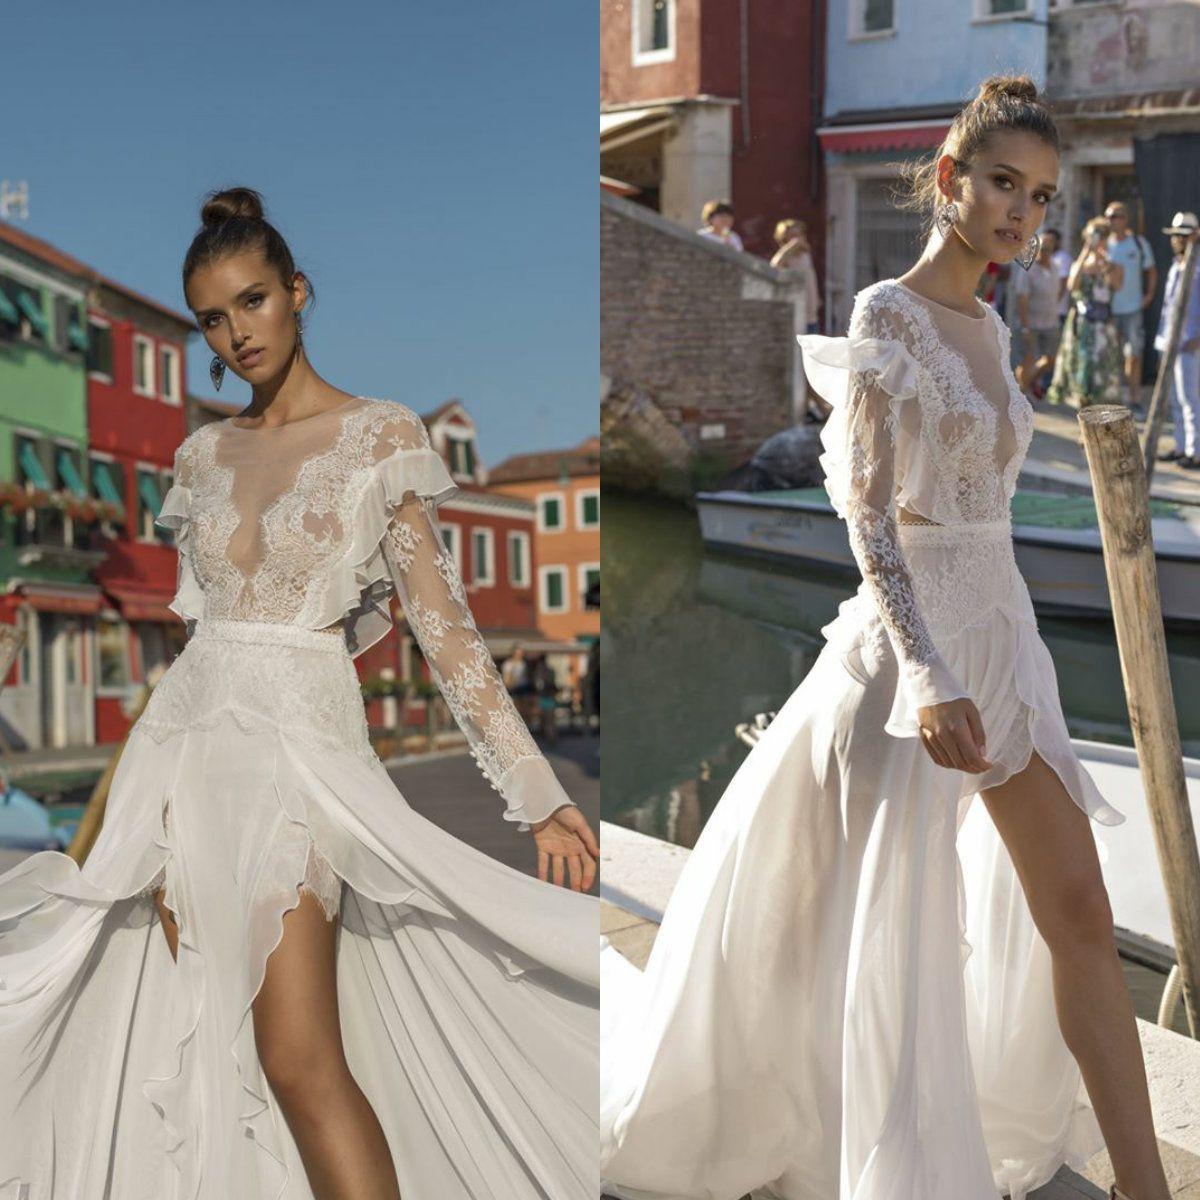 rivenditore all'ingrosso e4630 4b581 Pinella Passaro 2019 Beach Wedding Dresses Sheer Jewel Neck Lace Long  Sleeve Bridal Gowns Sexy Thigh High Splits Boho Wedding Dress